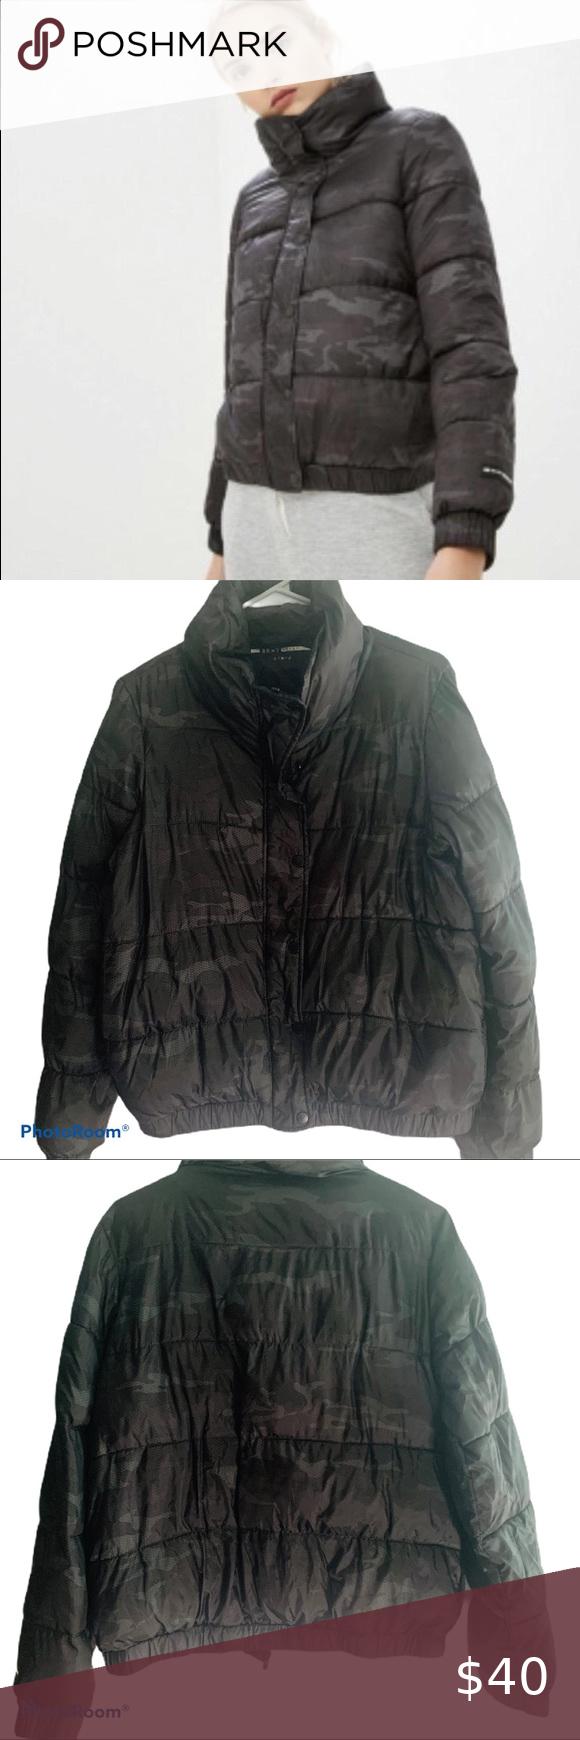 Dkny Sport Bomber Jacket Puffer Coat With Fur Vintage High Waisted Shorts Coats Jackets Women [ 1740 x 580 Pixel ]